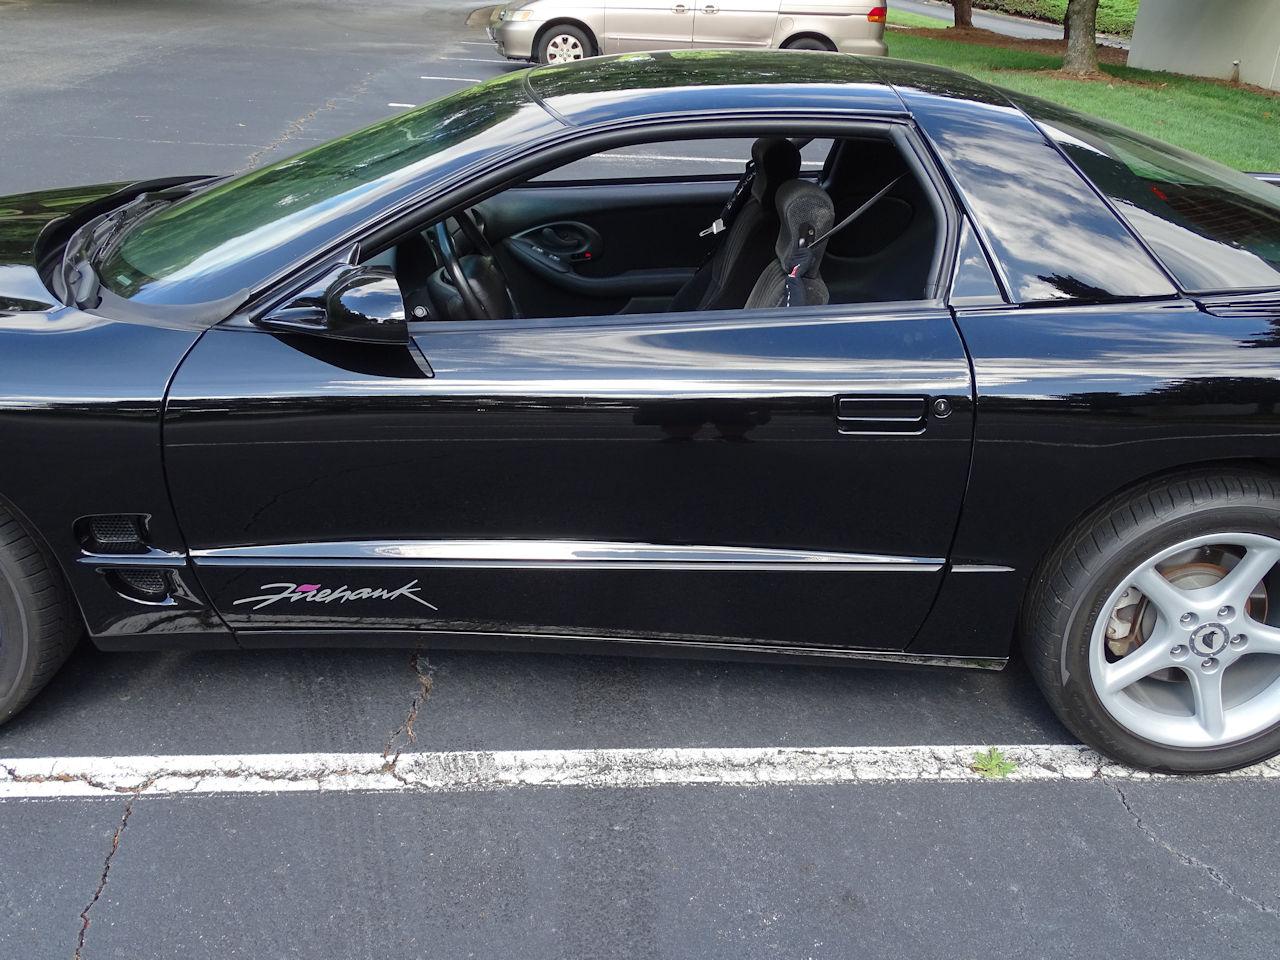 2001 Pontiac Firebird 43